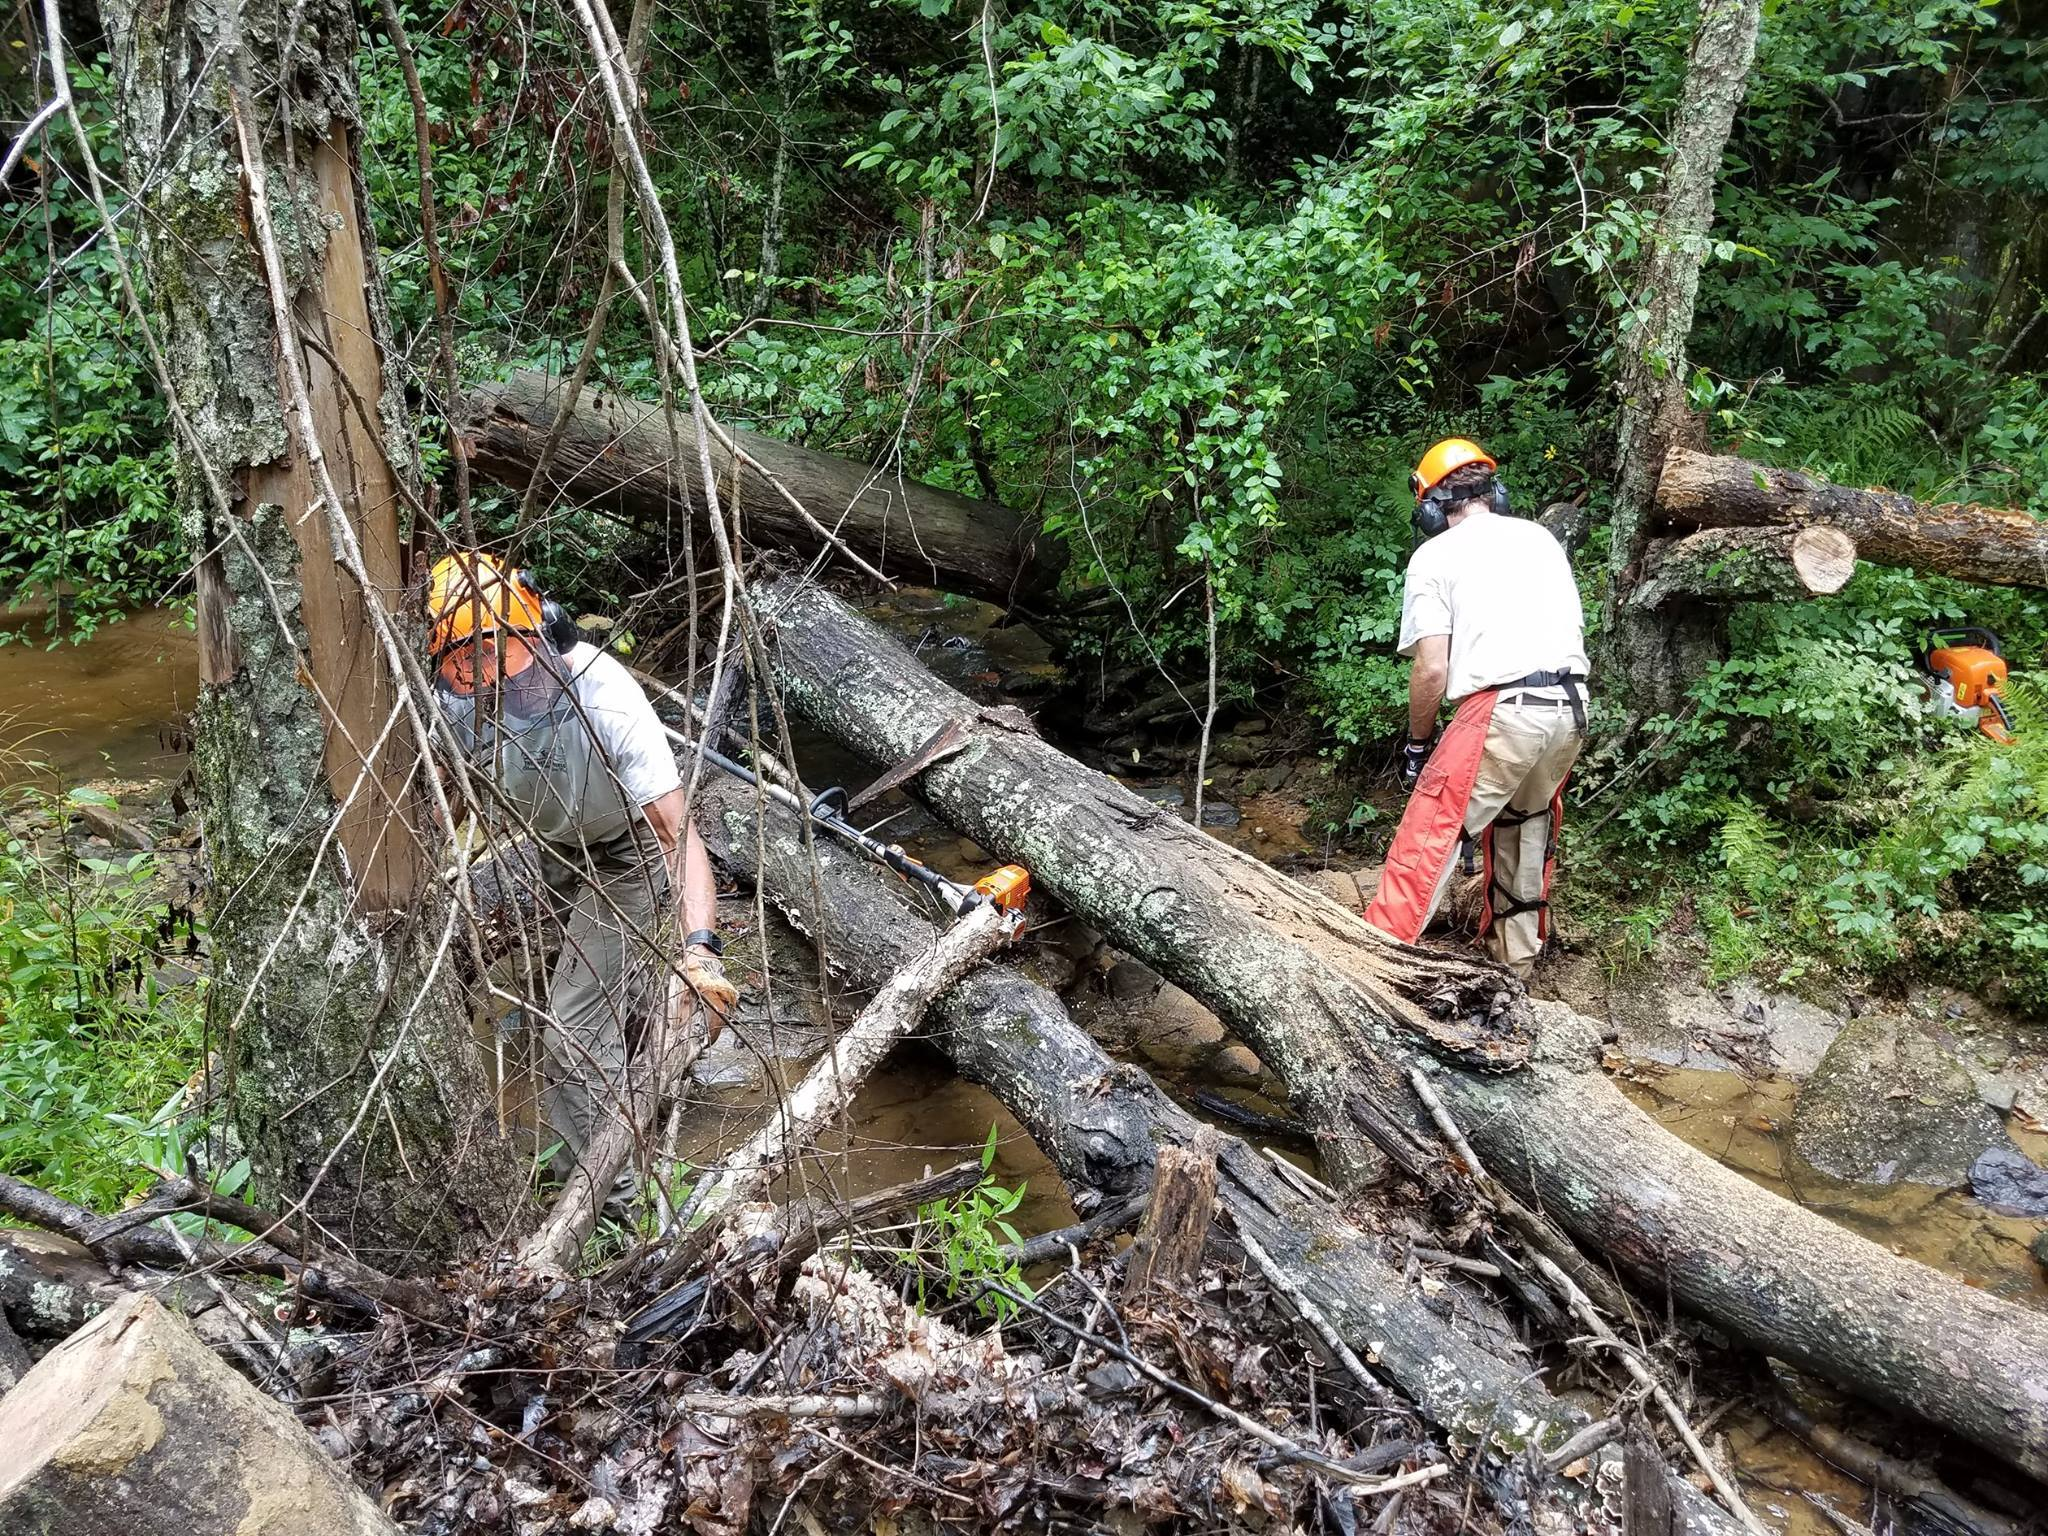 FSM-Trail-Crew-clearing-a-Trail